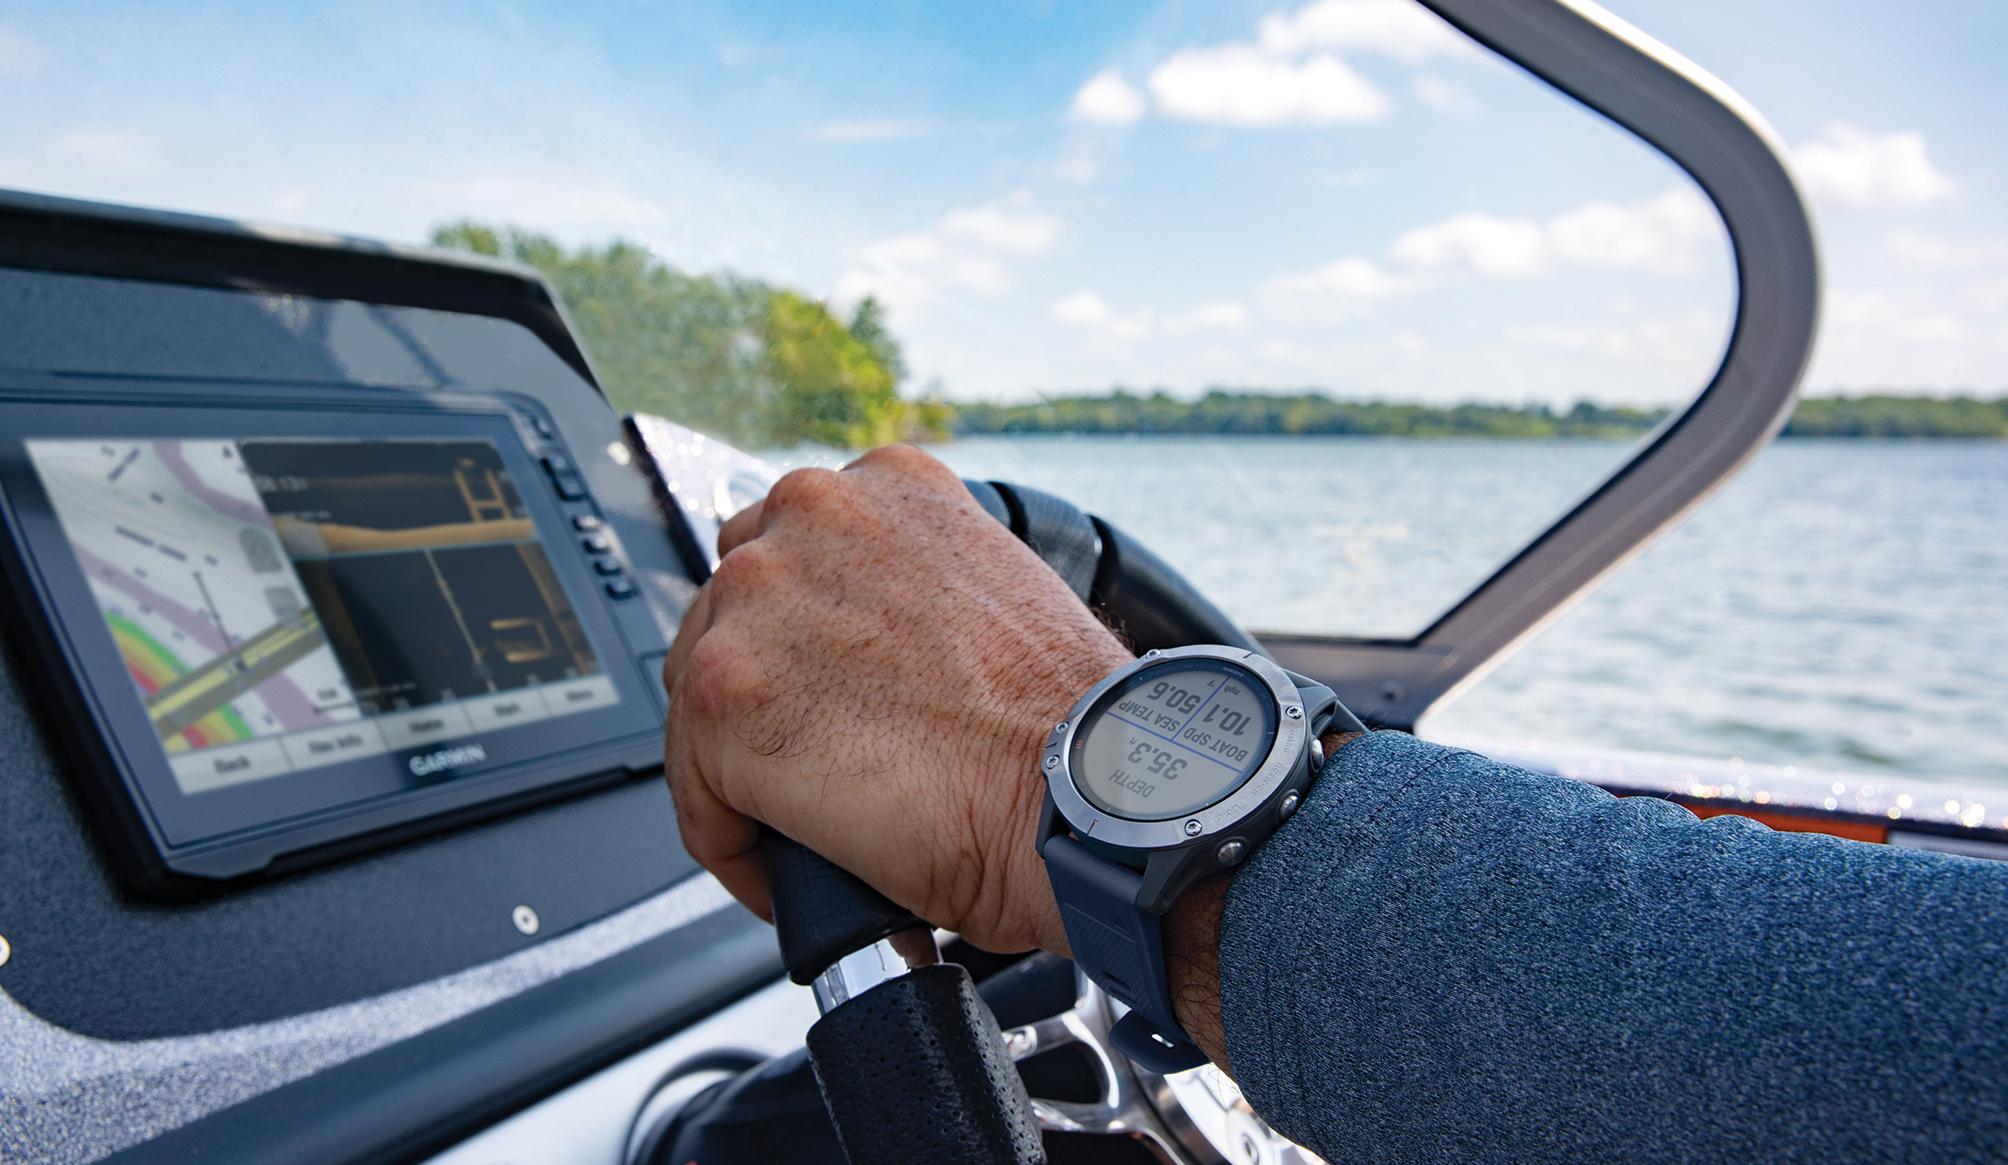 garmin-quatix-6-boating-smart-watch-helm